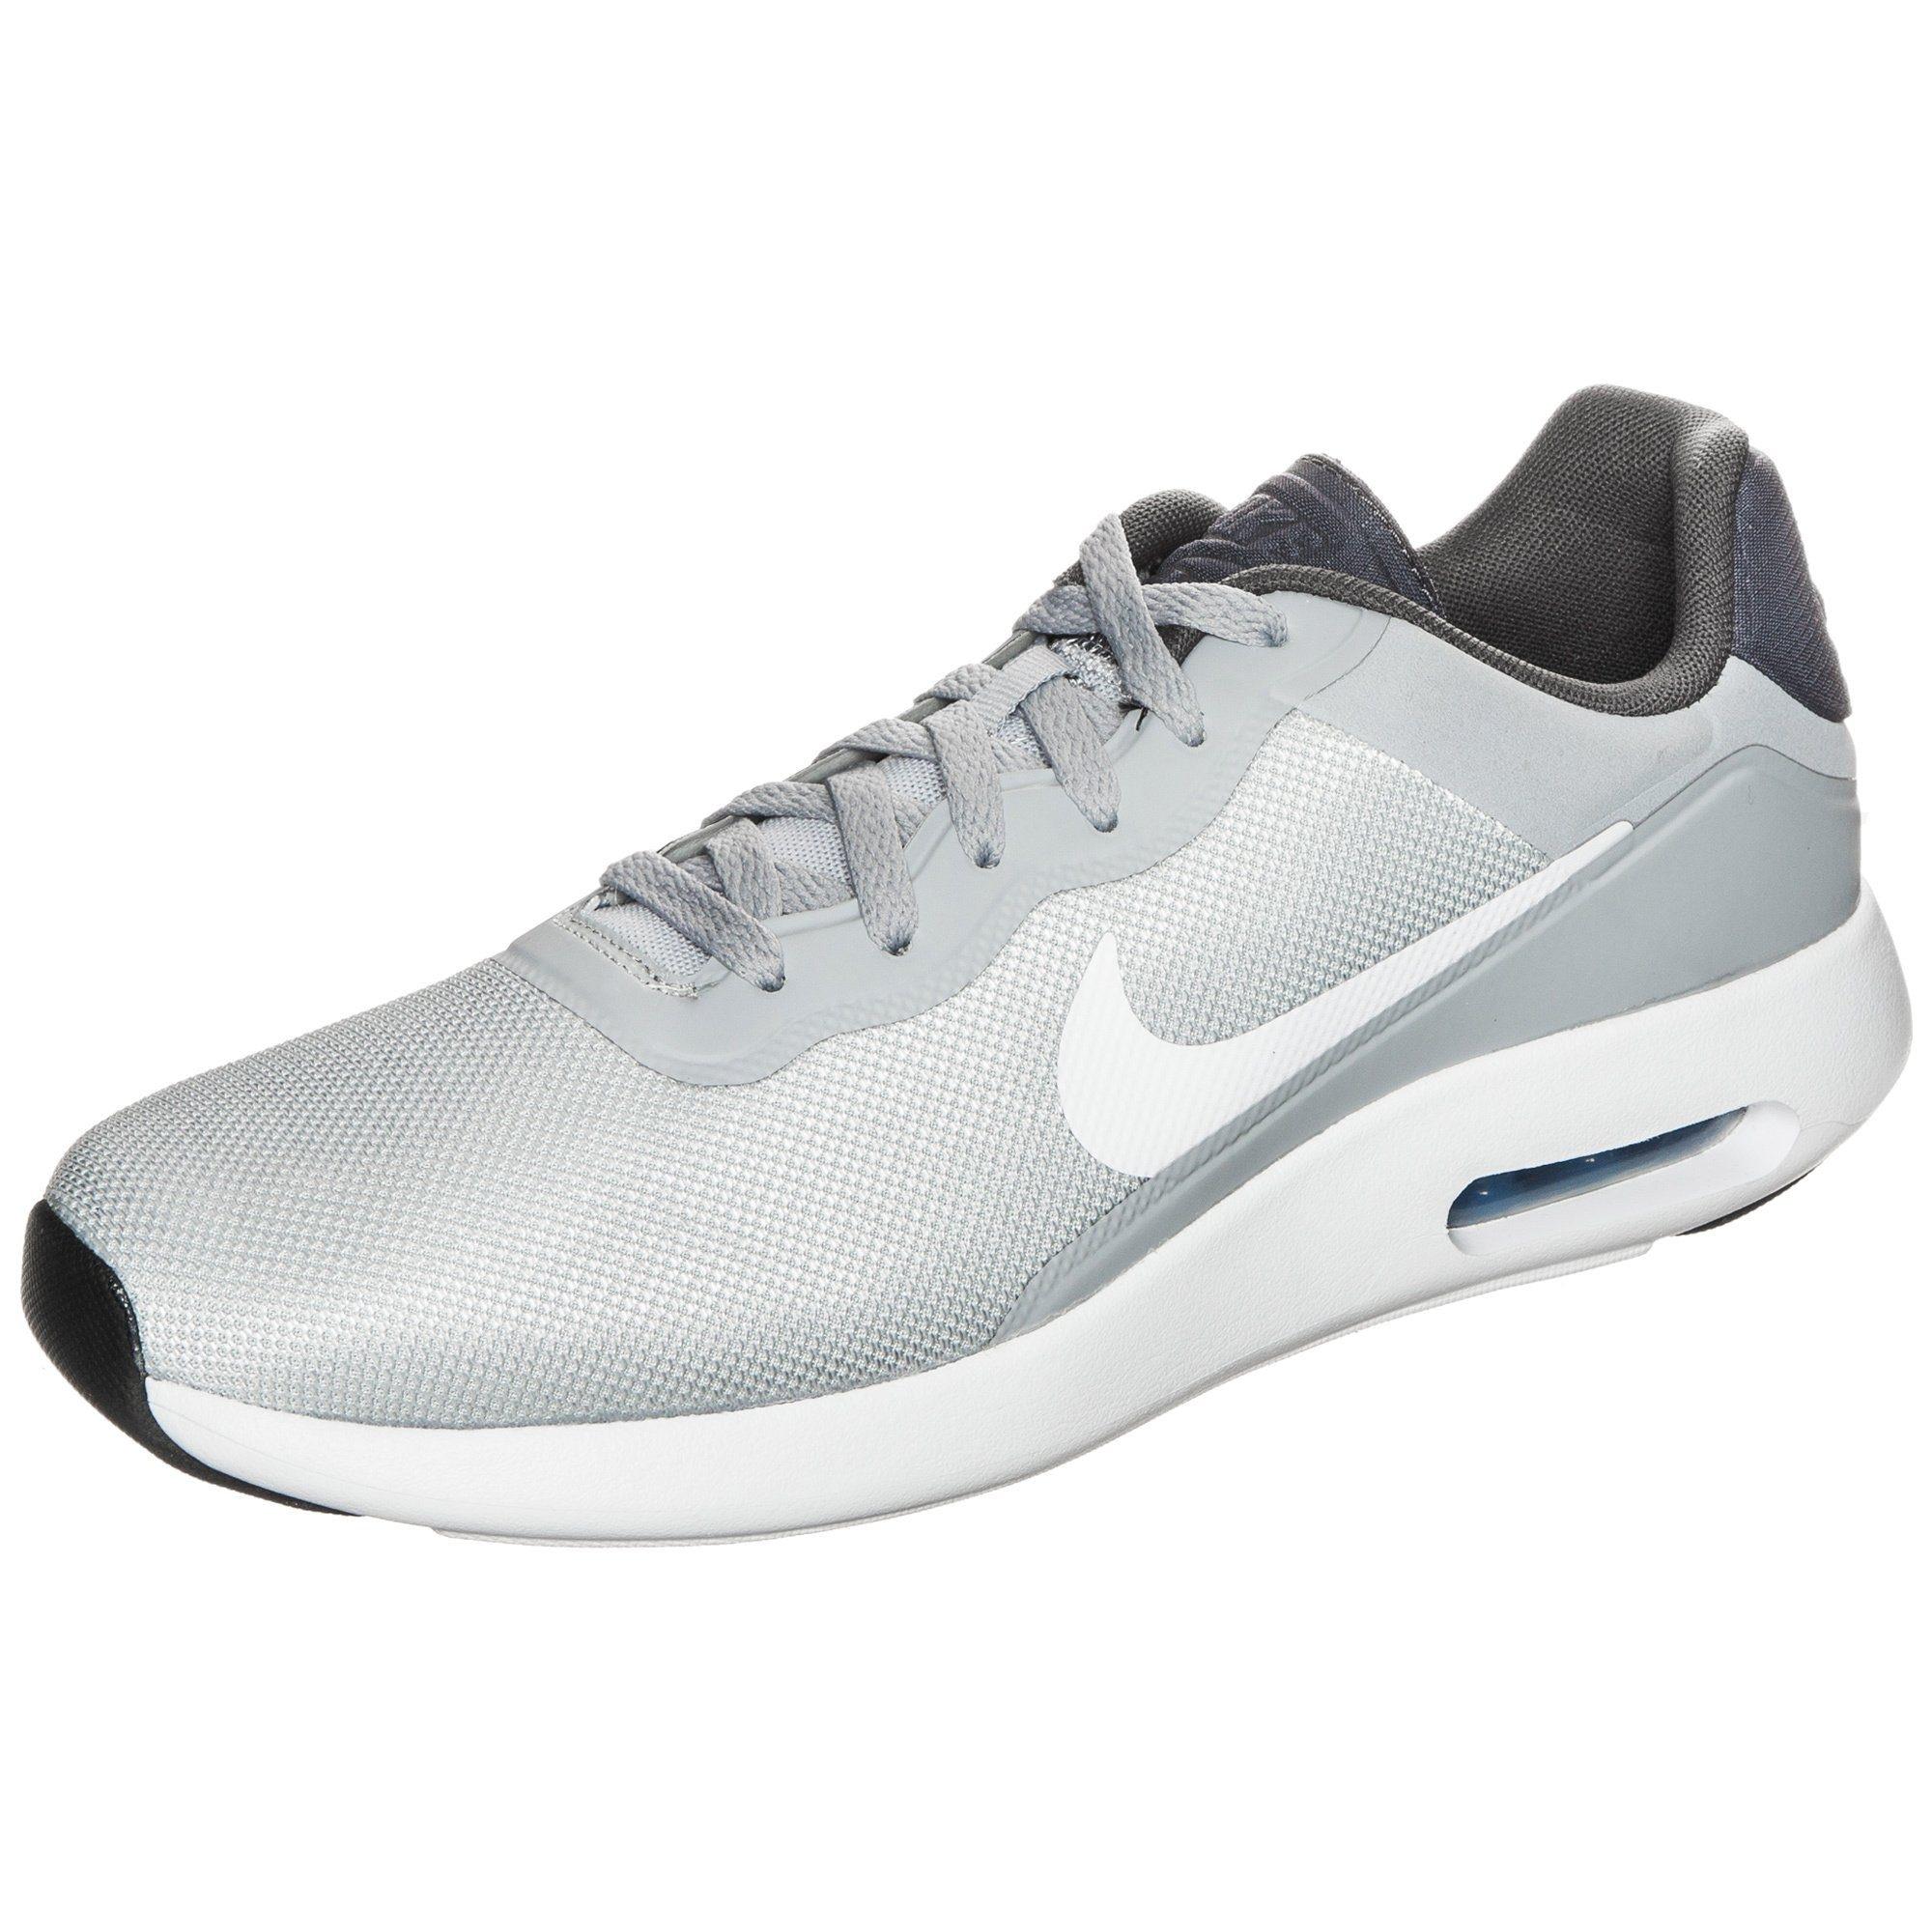 Nike Sportswear Turnschuhe ;Air Max Modern Essential günstig